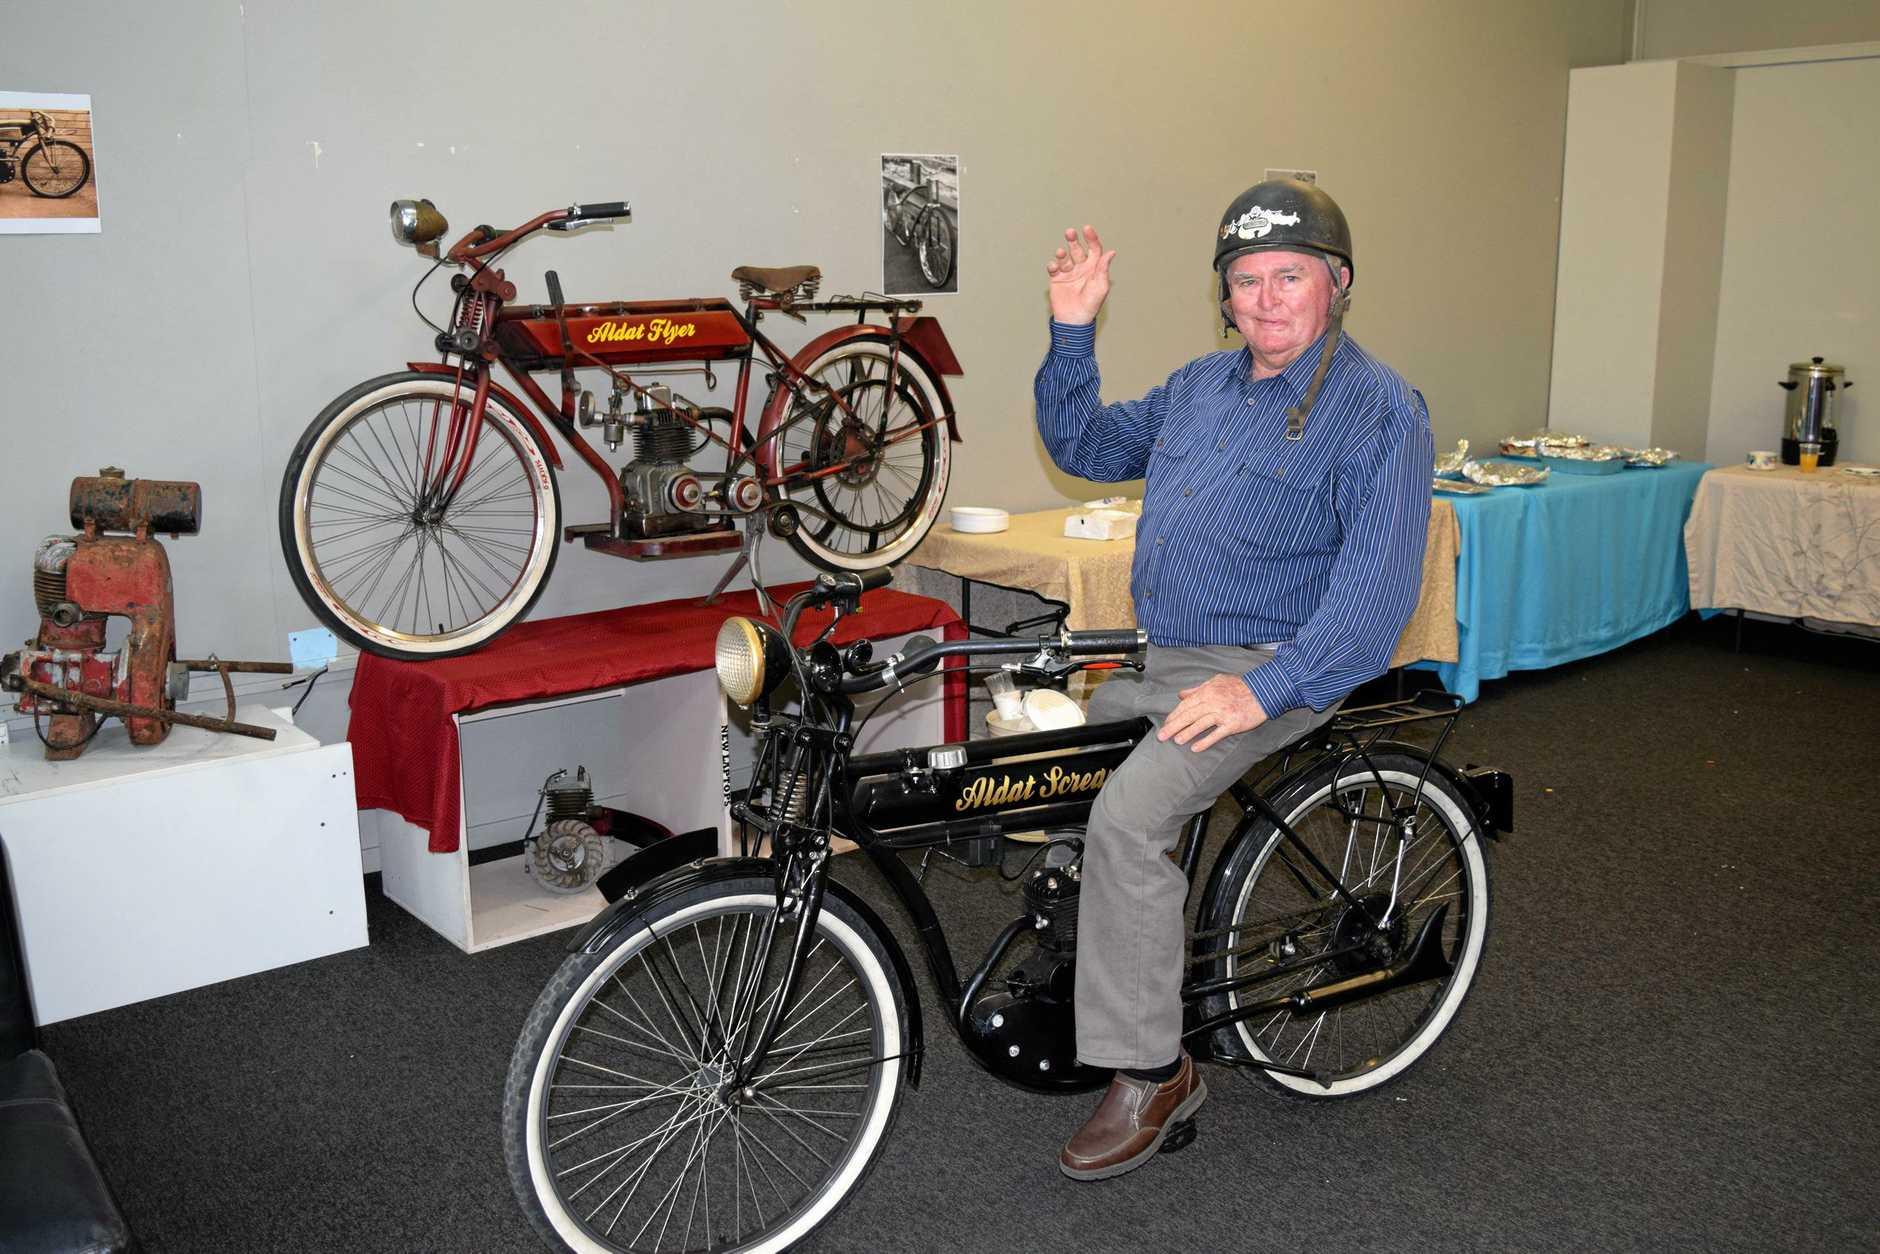 Motorcycle veteran John Hastings displayed his replica Pioneer Motorbike at the official opening of the Independent Riders Workshop.